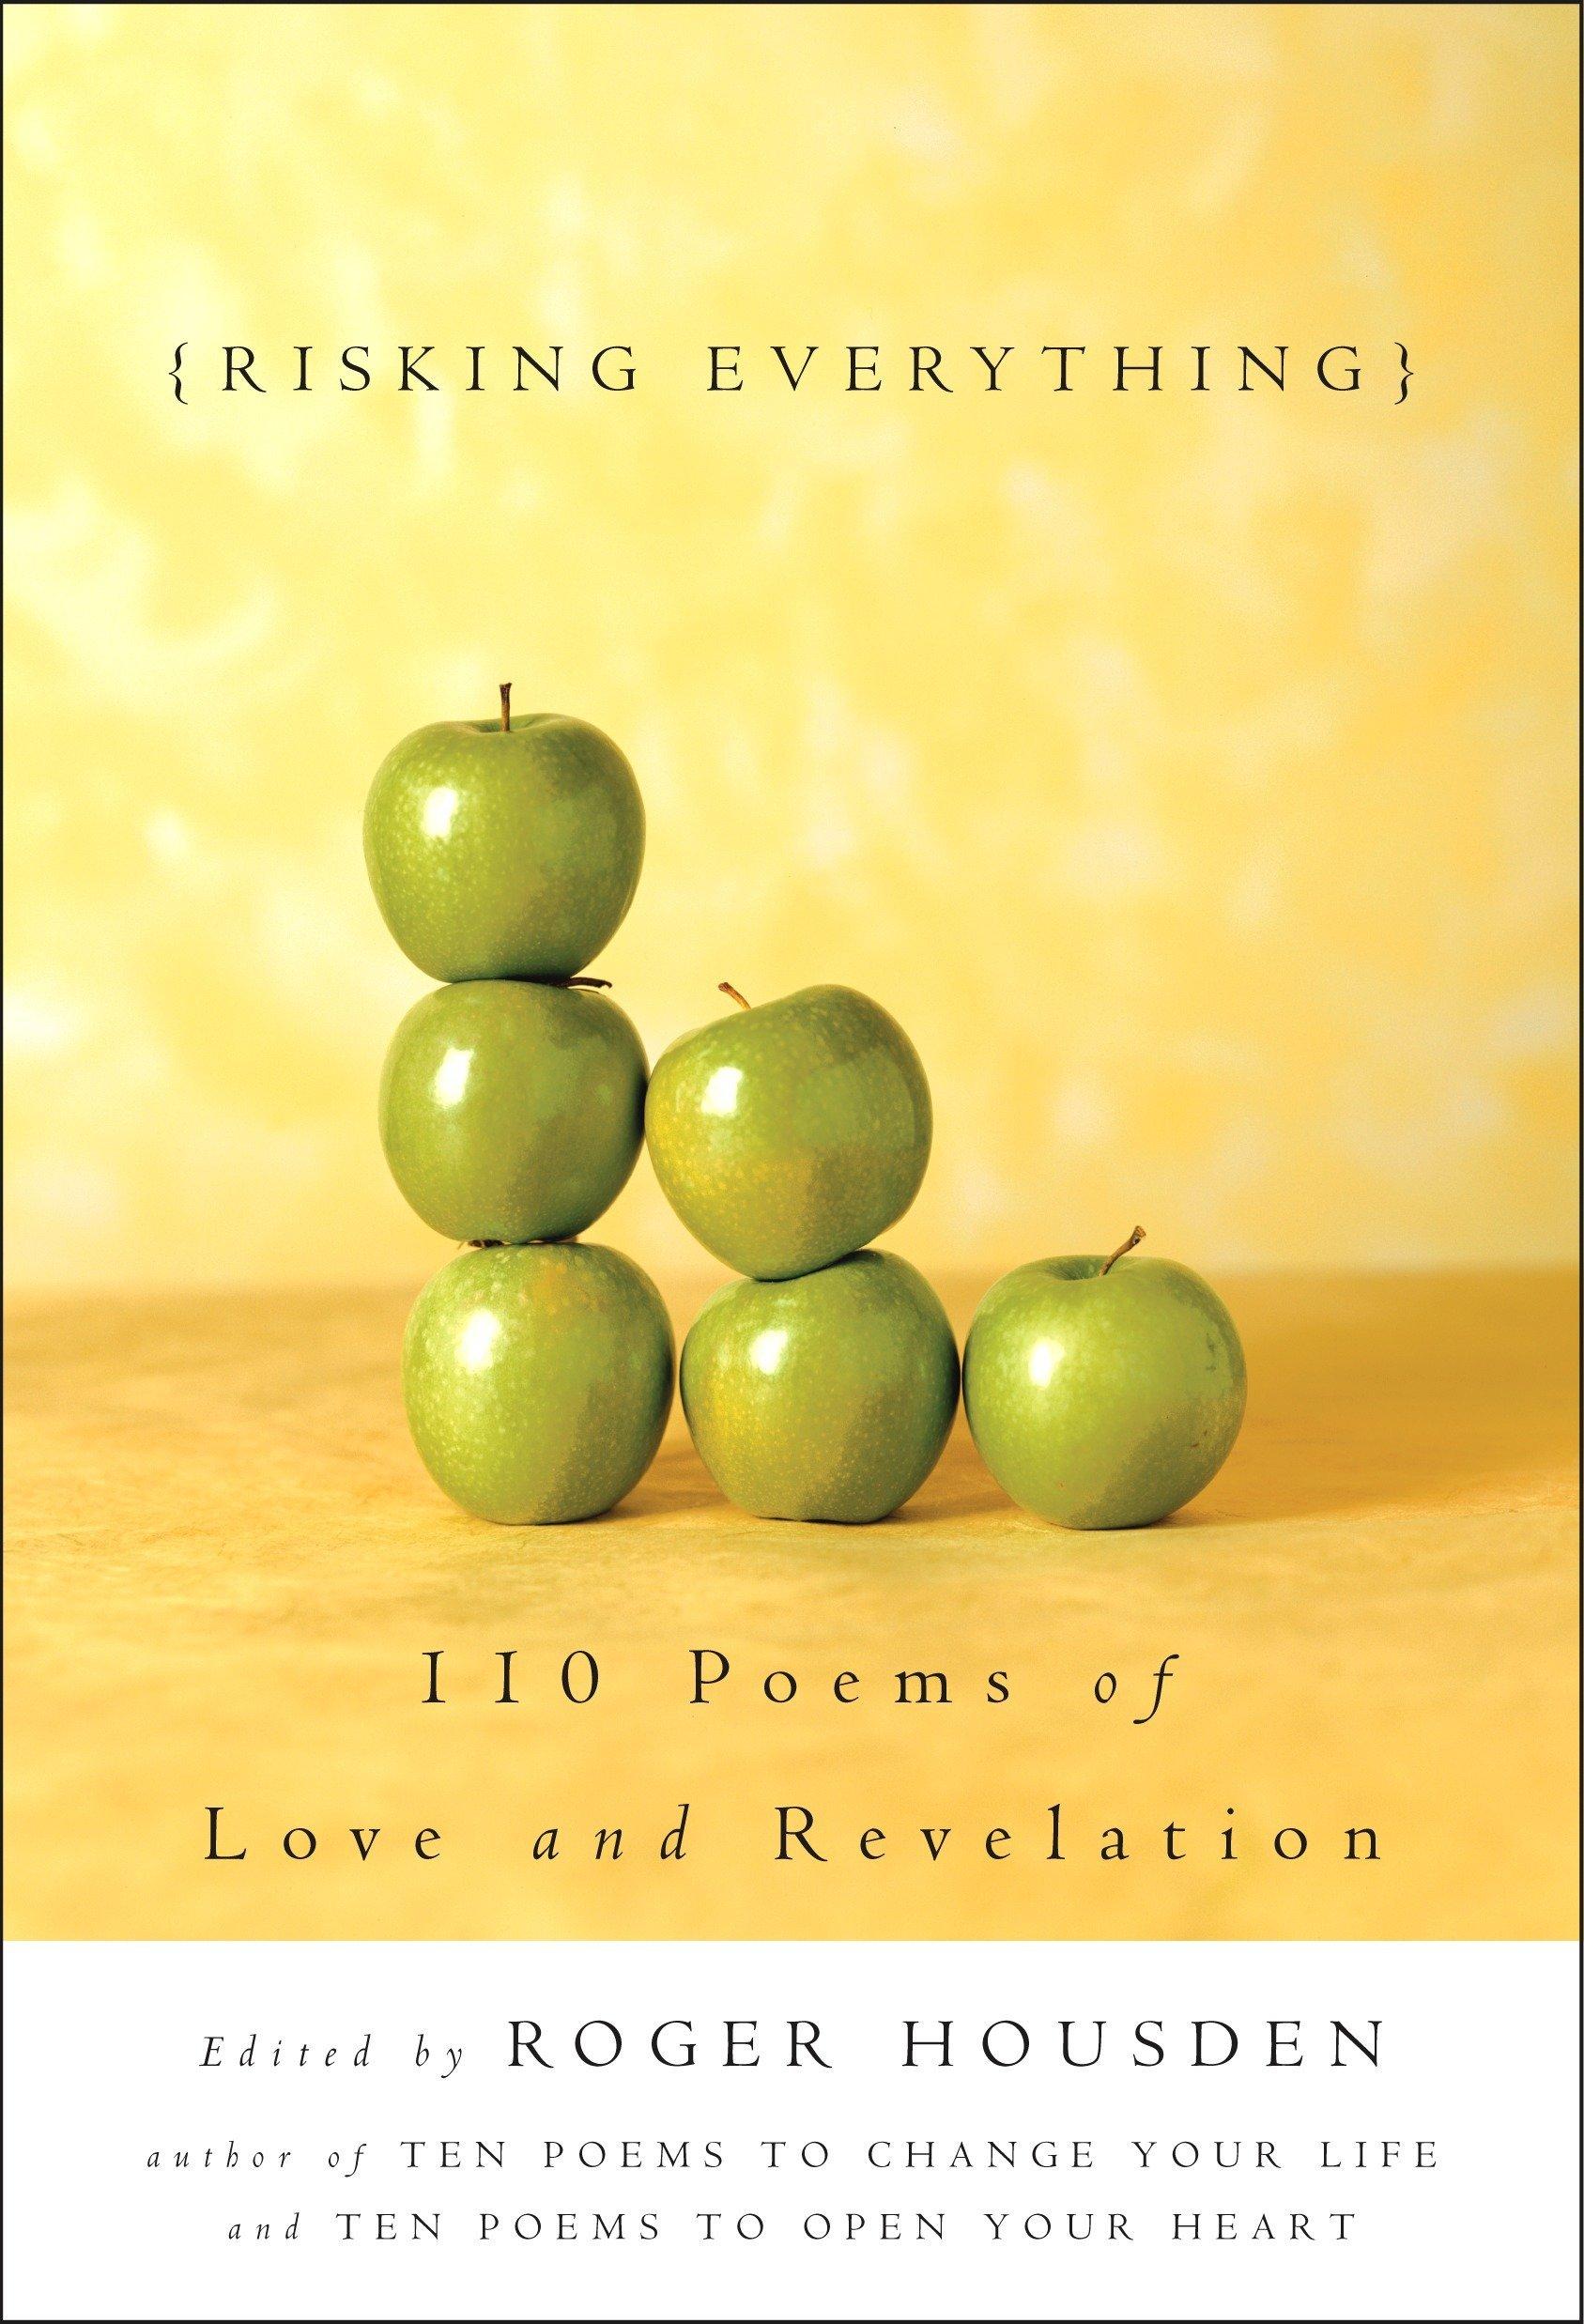 Risking Everything 110 Poems Of Love And Revelation Roger Housden